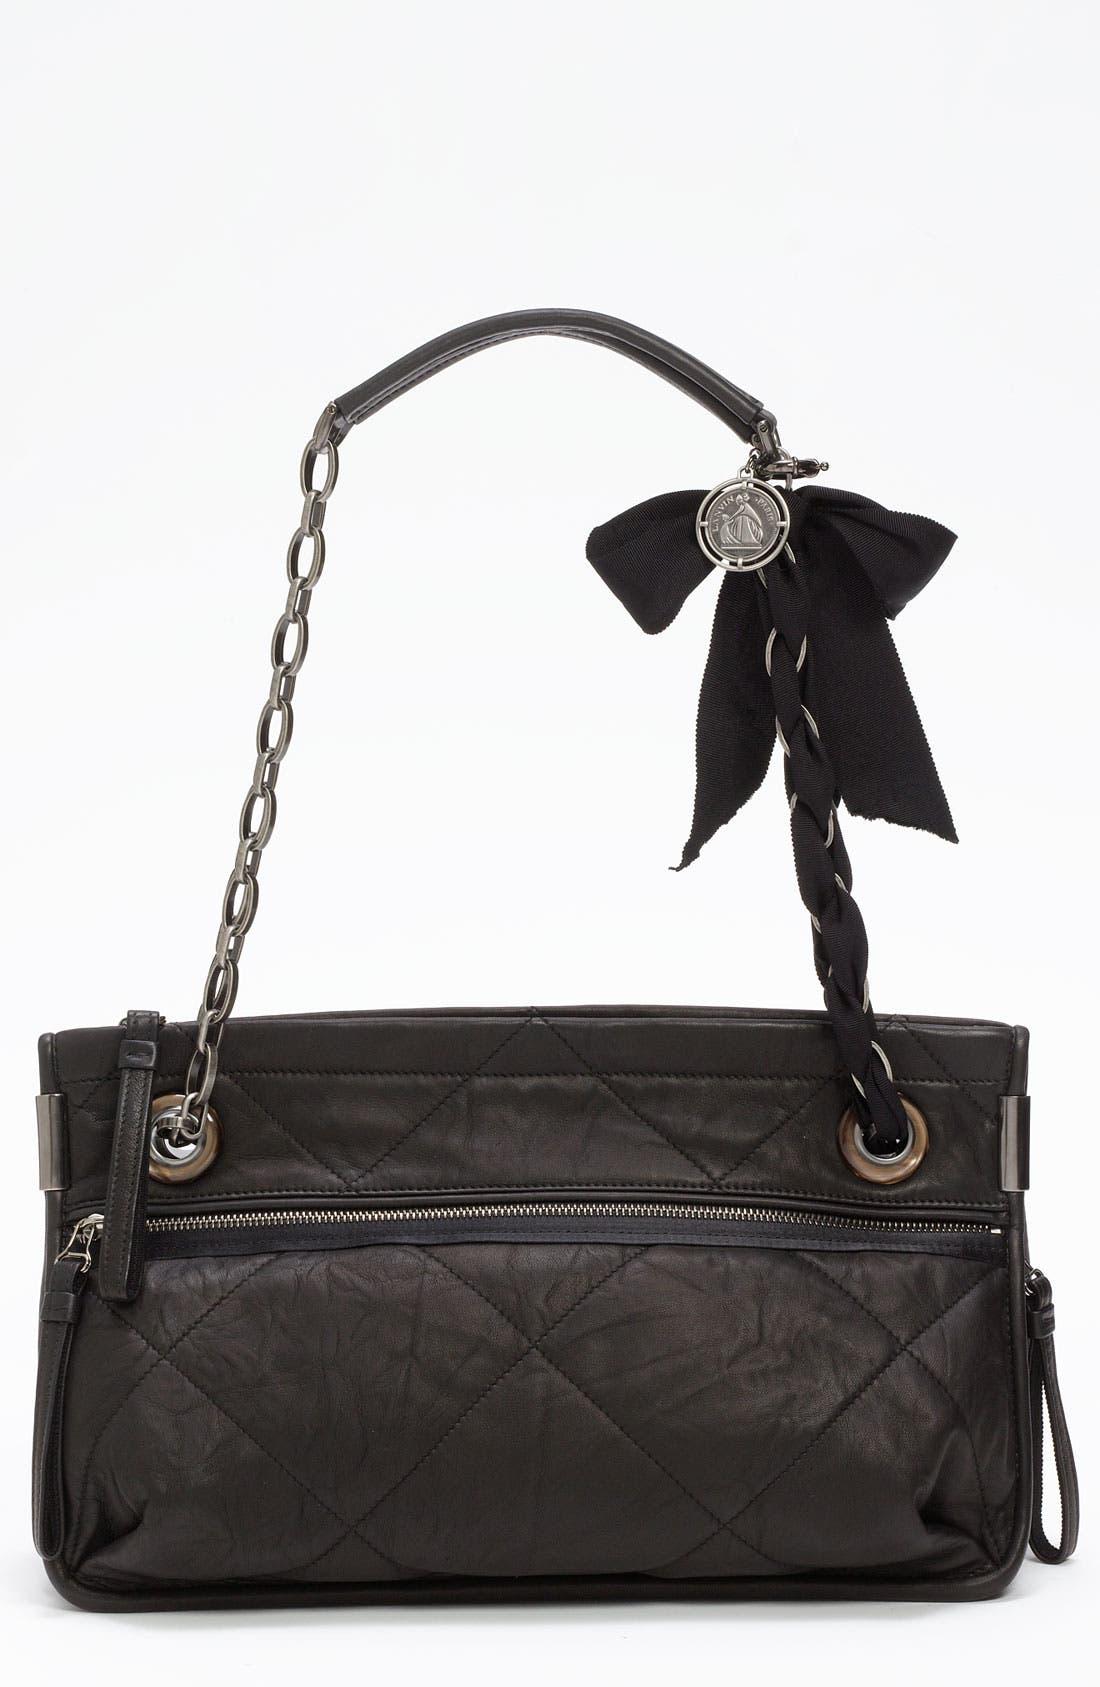 Main Image - Lanvin 'Amalia - Medium' Leather Shoulder Bag